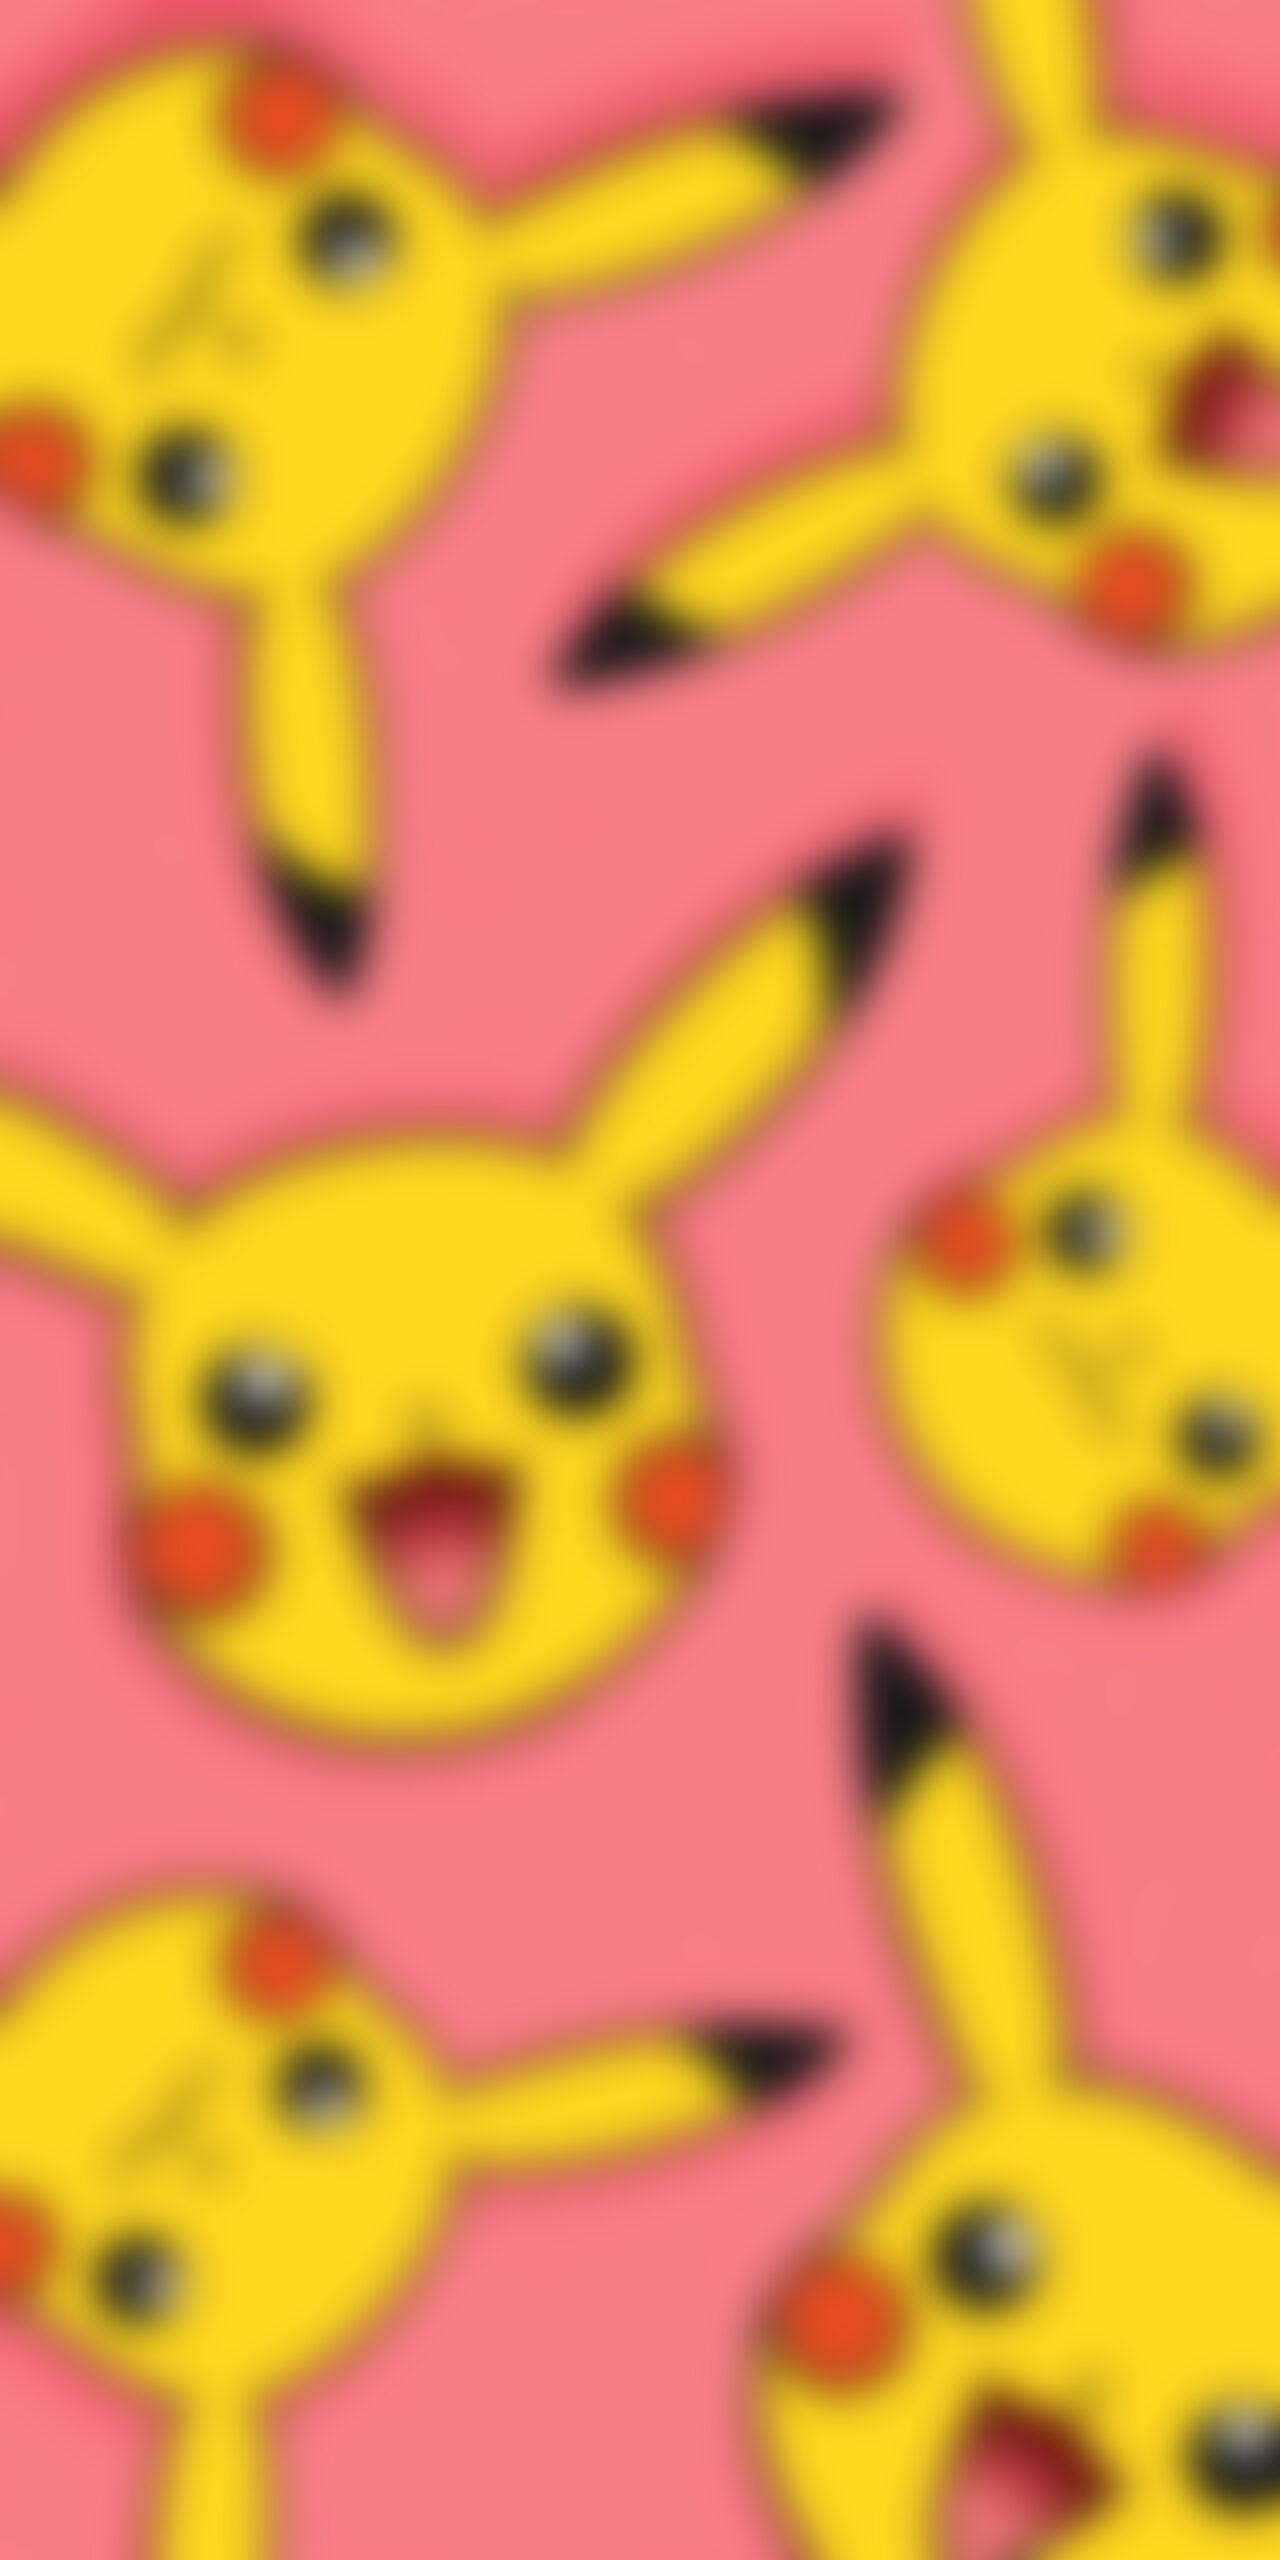 pokemon smiling pikachu pink blur wallpaper